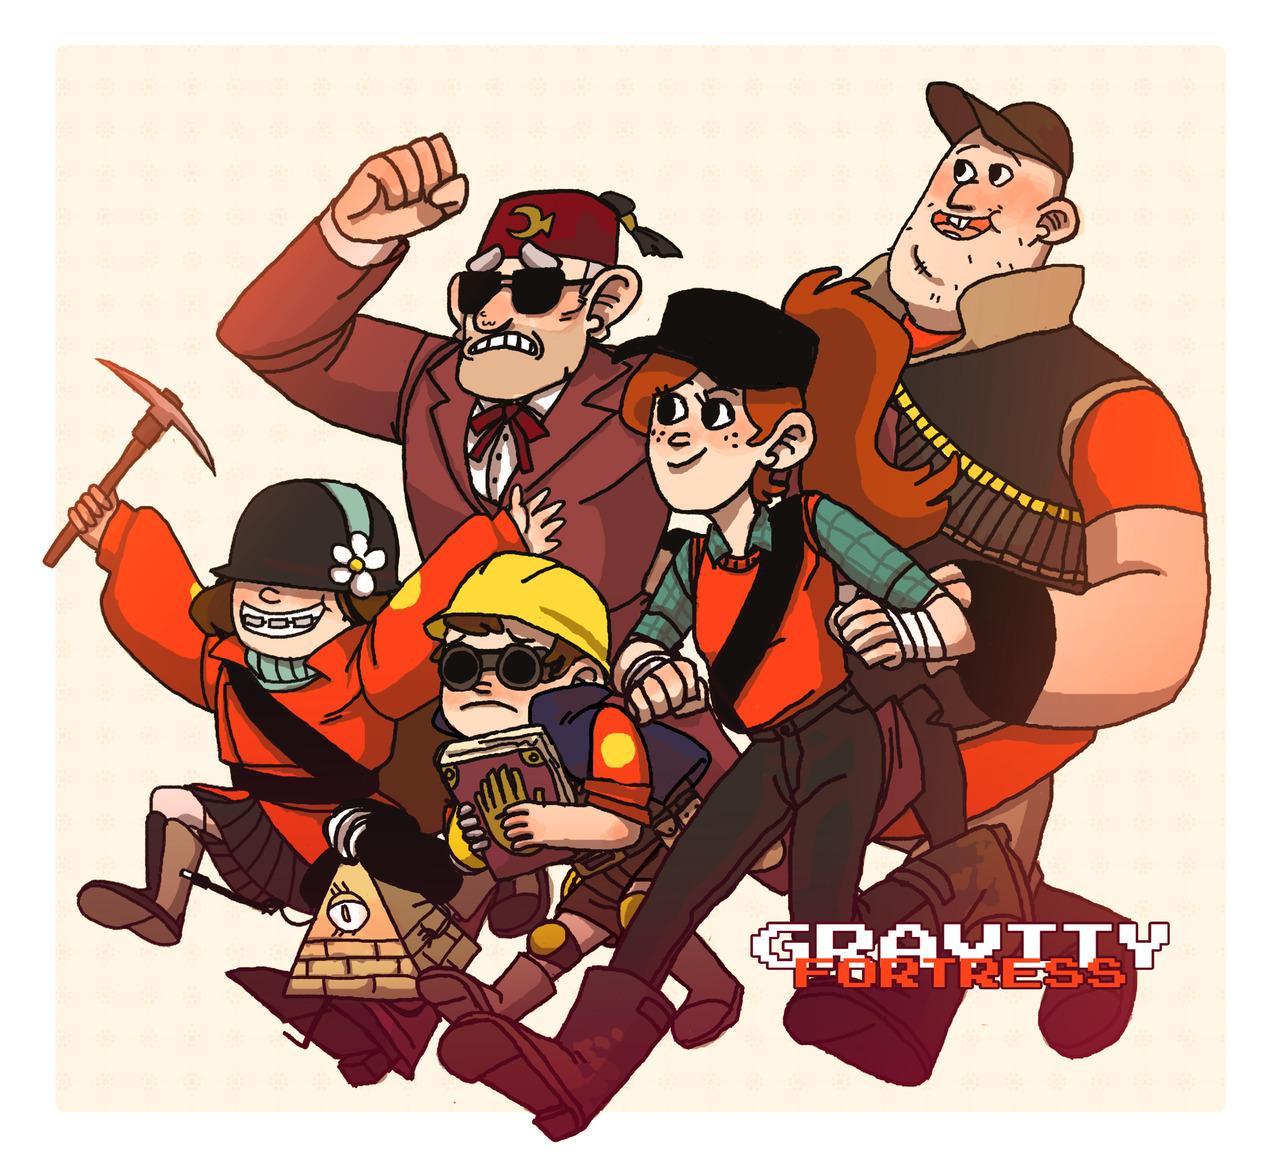 Gravity Falls Trust No One Wallpaper Http Gatherersgarden Tumblr Com Post 28965873585 Do You